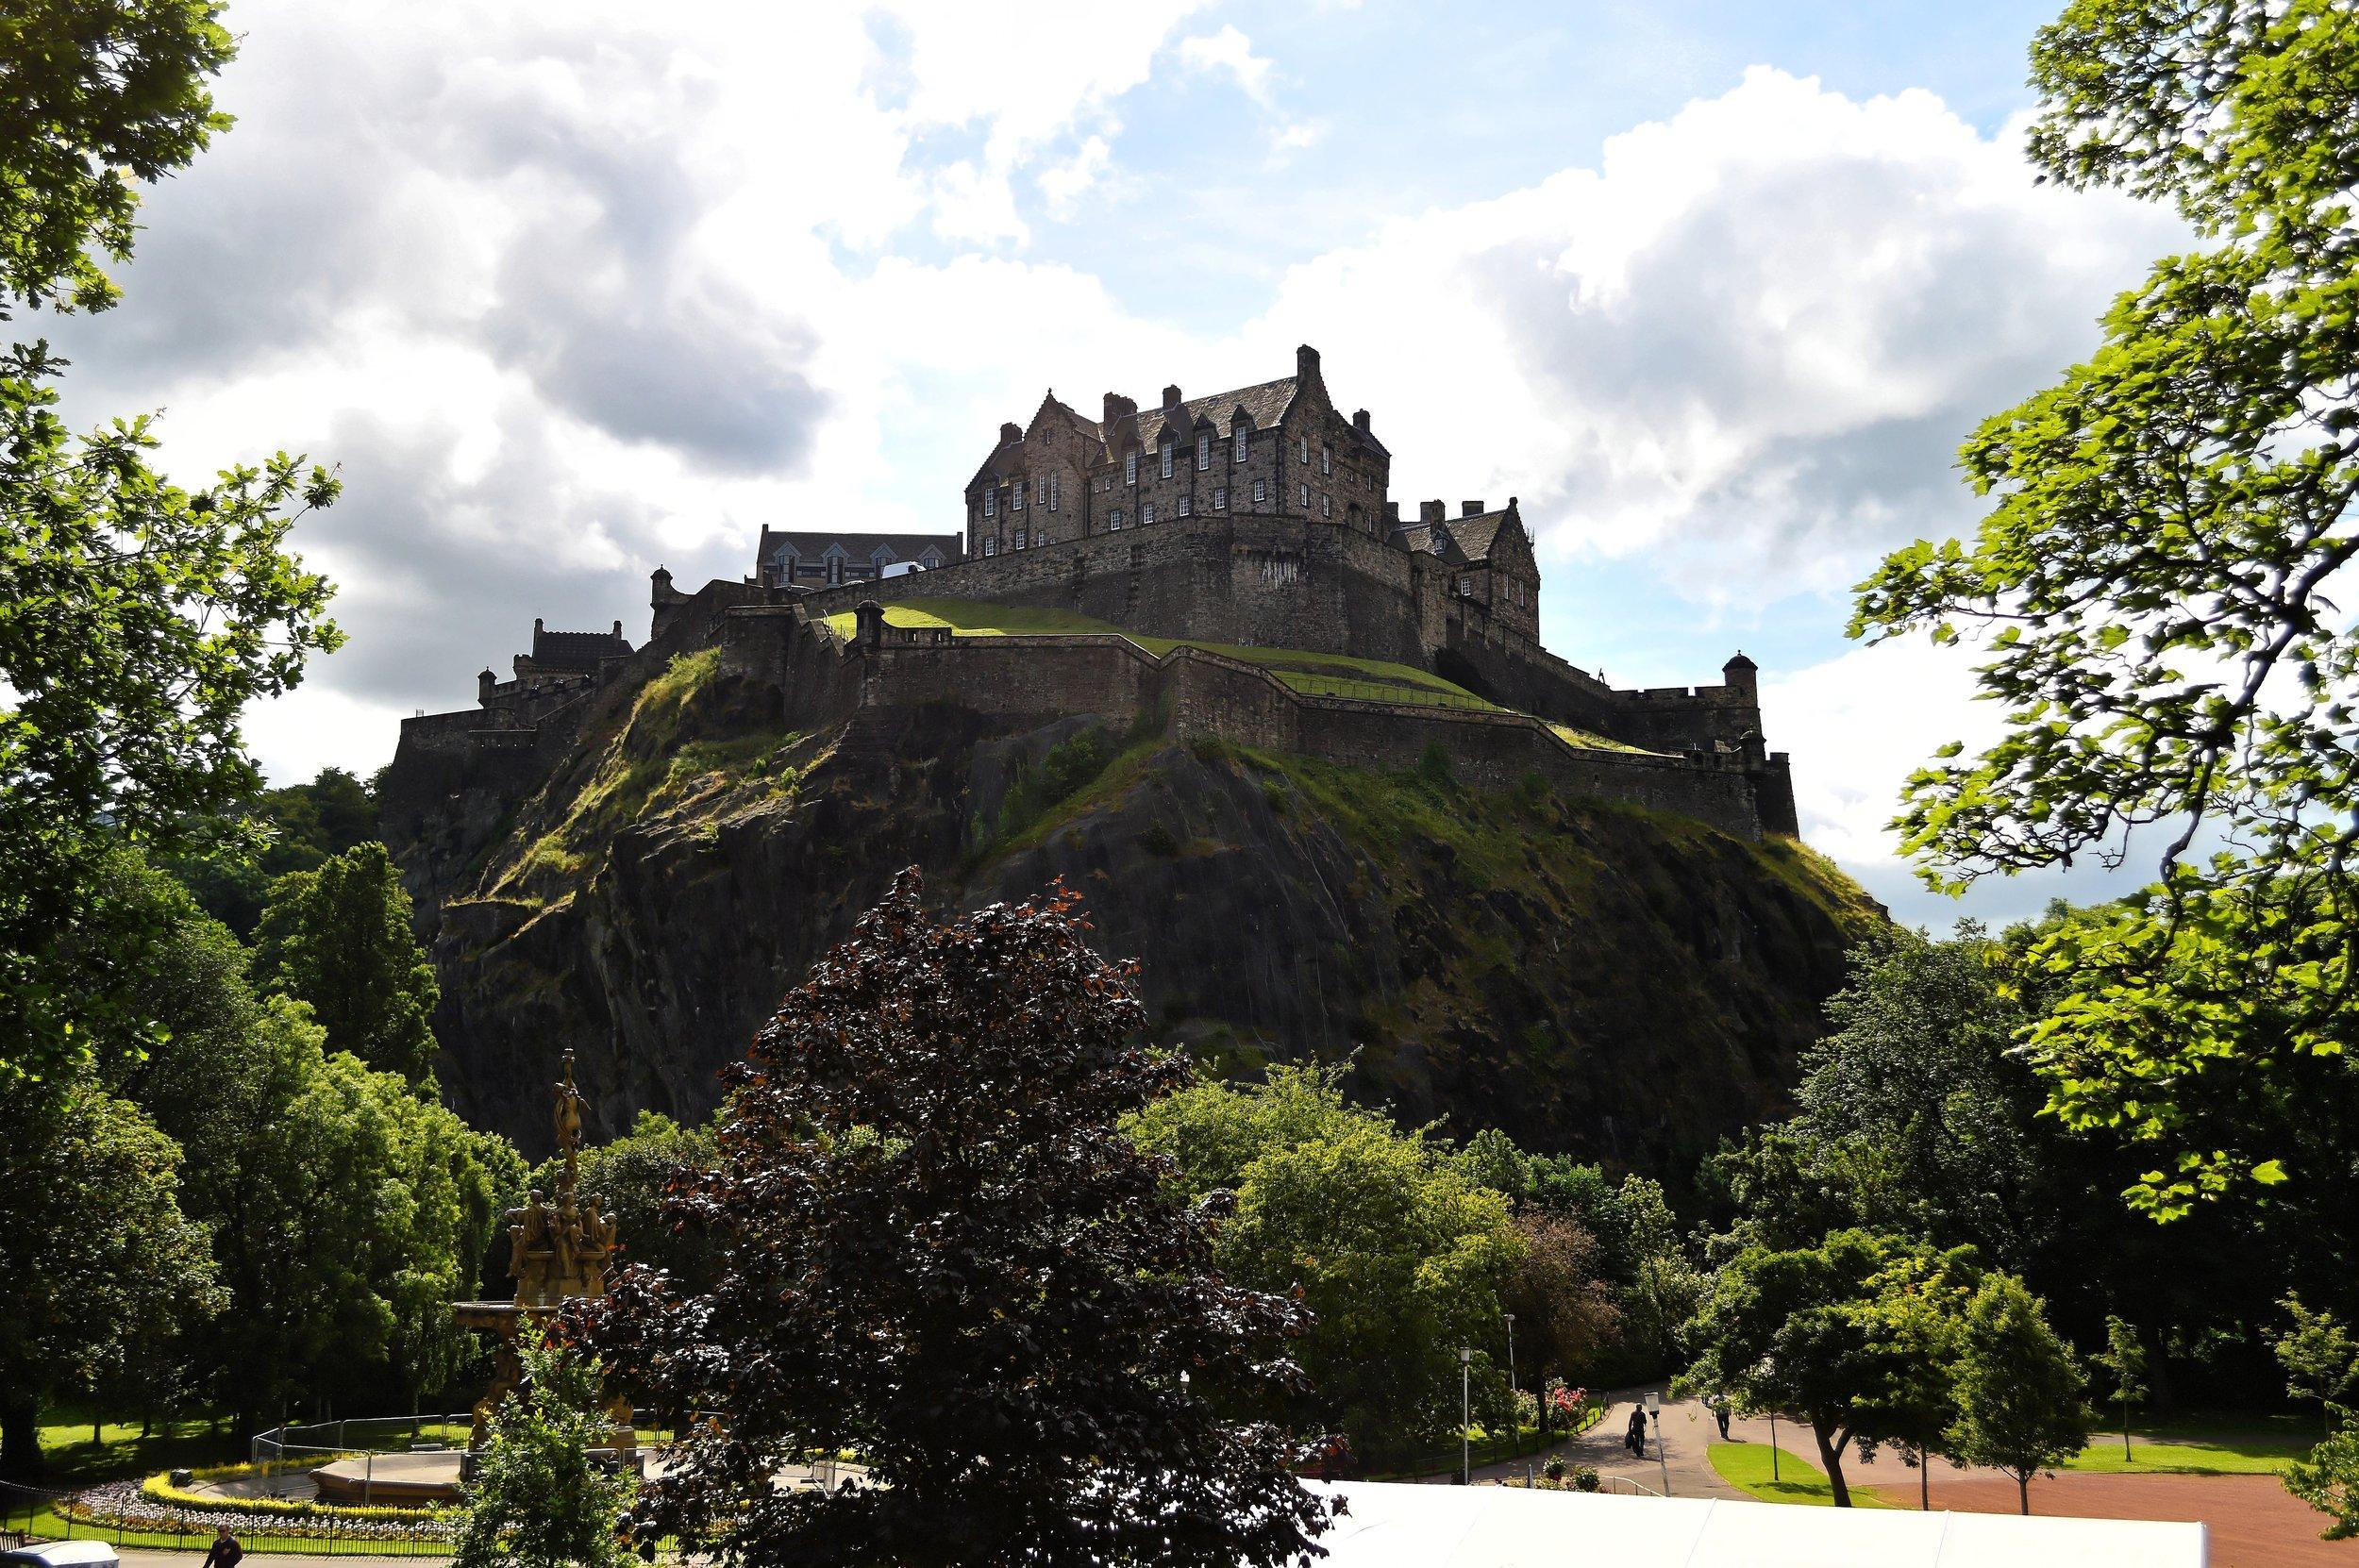 edinburgh-castle-edinburgh-castle-scotland-city-1.jpg